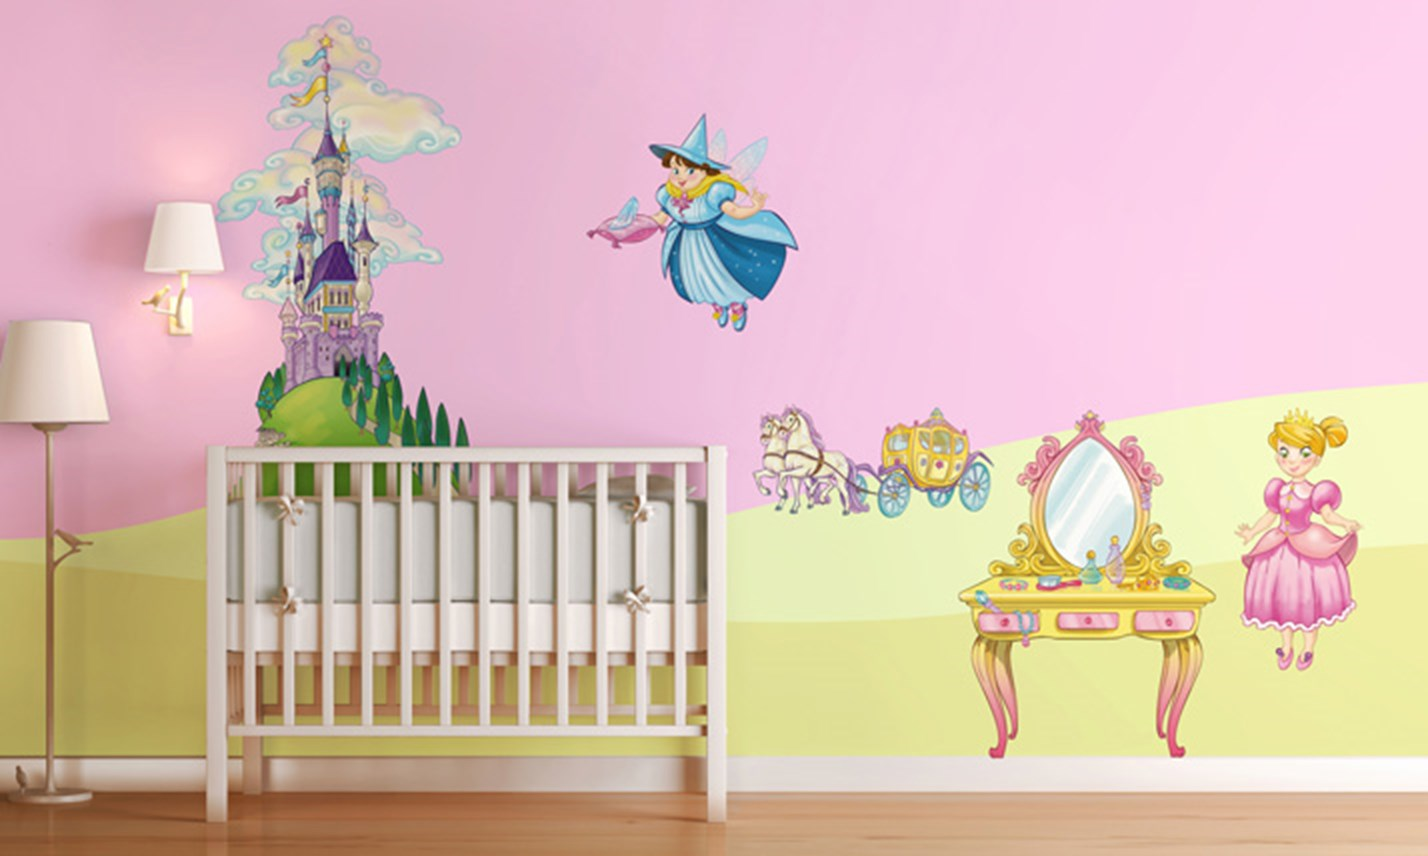 Cameretta Bimba Principesse Disney : Camerette delle principesse disney finest camerette delle